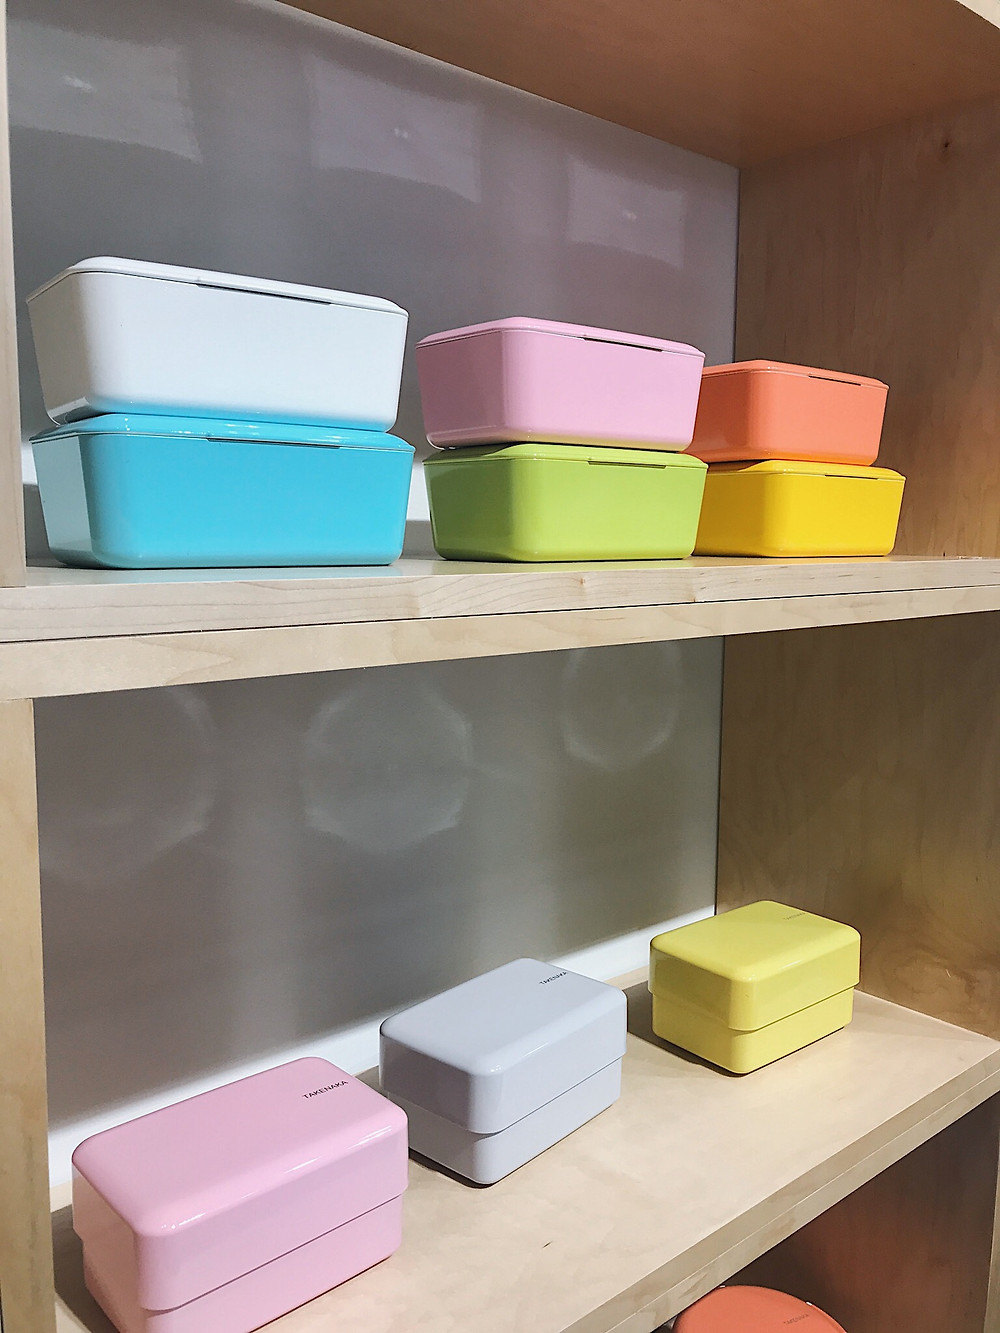 Bento Box by Takanak food storage boxes